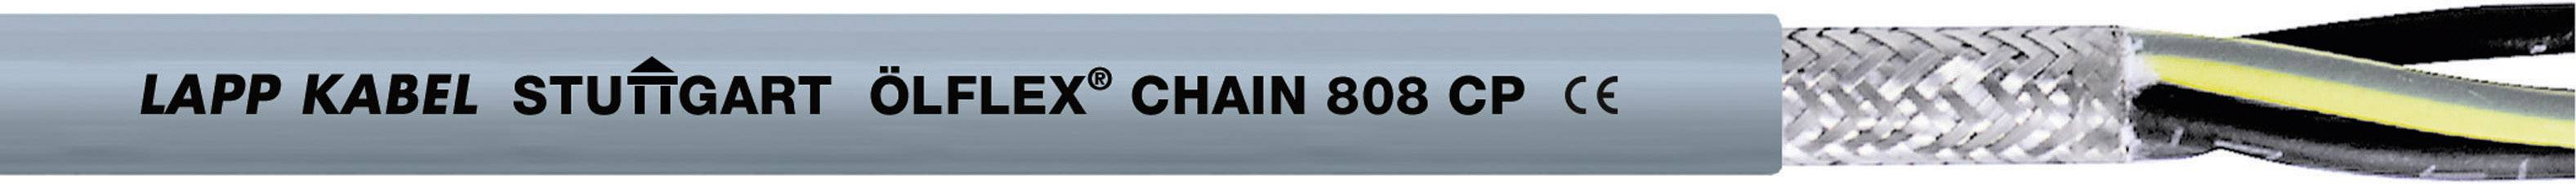 Žíla kabelu LappKabel ÖLFLEX CHAIN 808 CP 3G1,0 (1027768), 3x 1 mm², polyurethan, Ø 6,9 mm, stíněný, 100 m, še